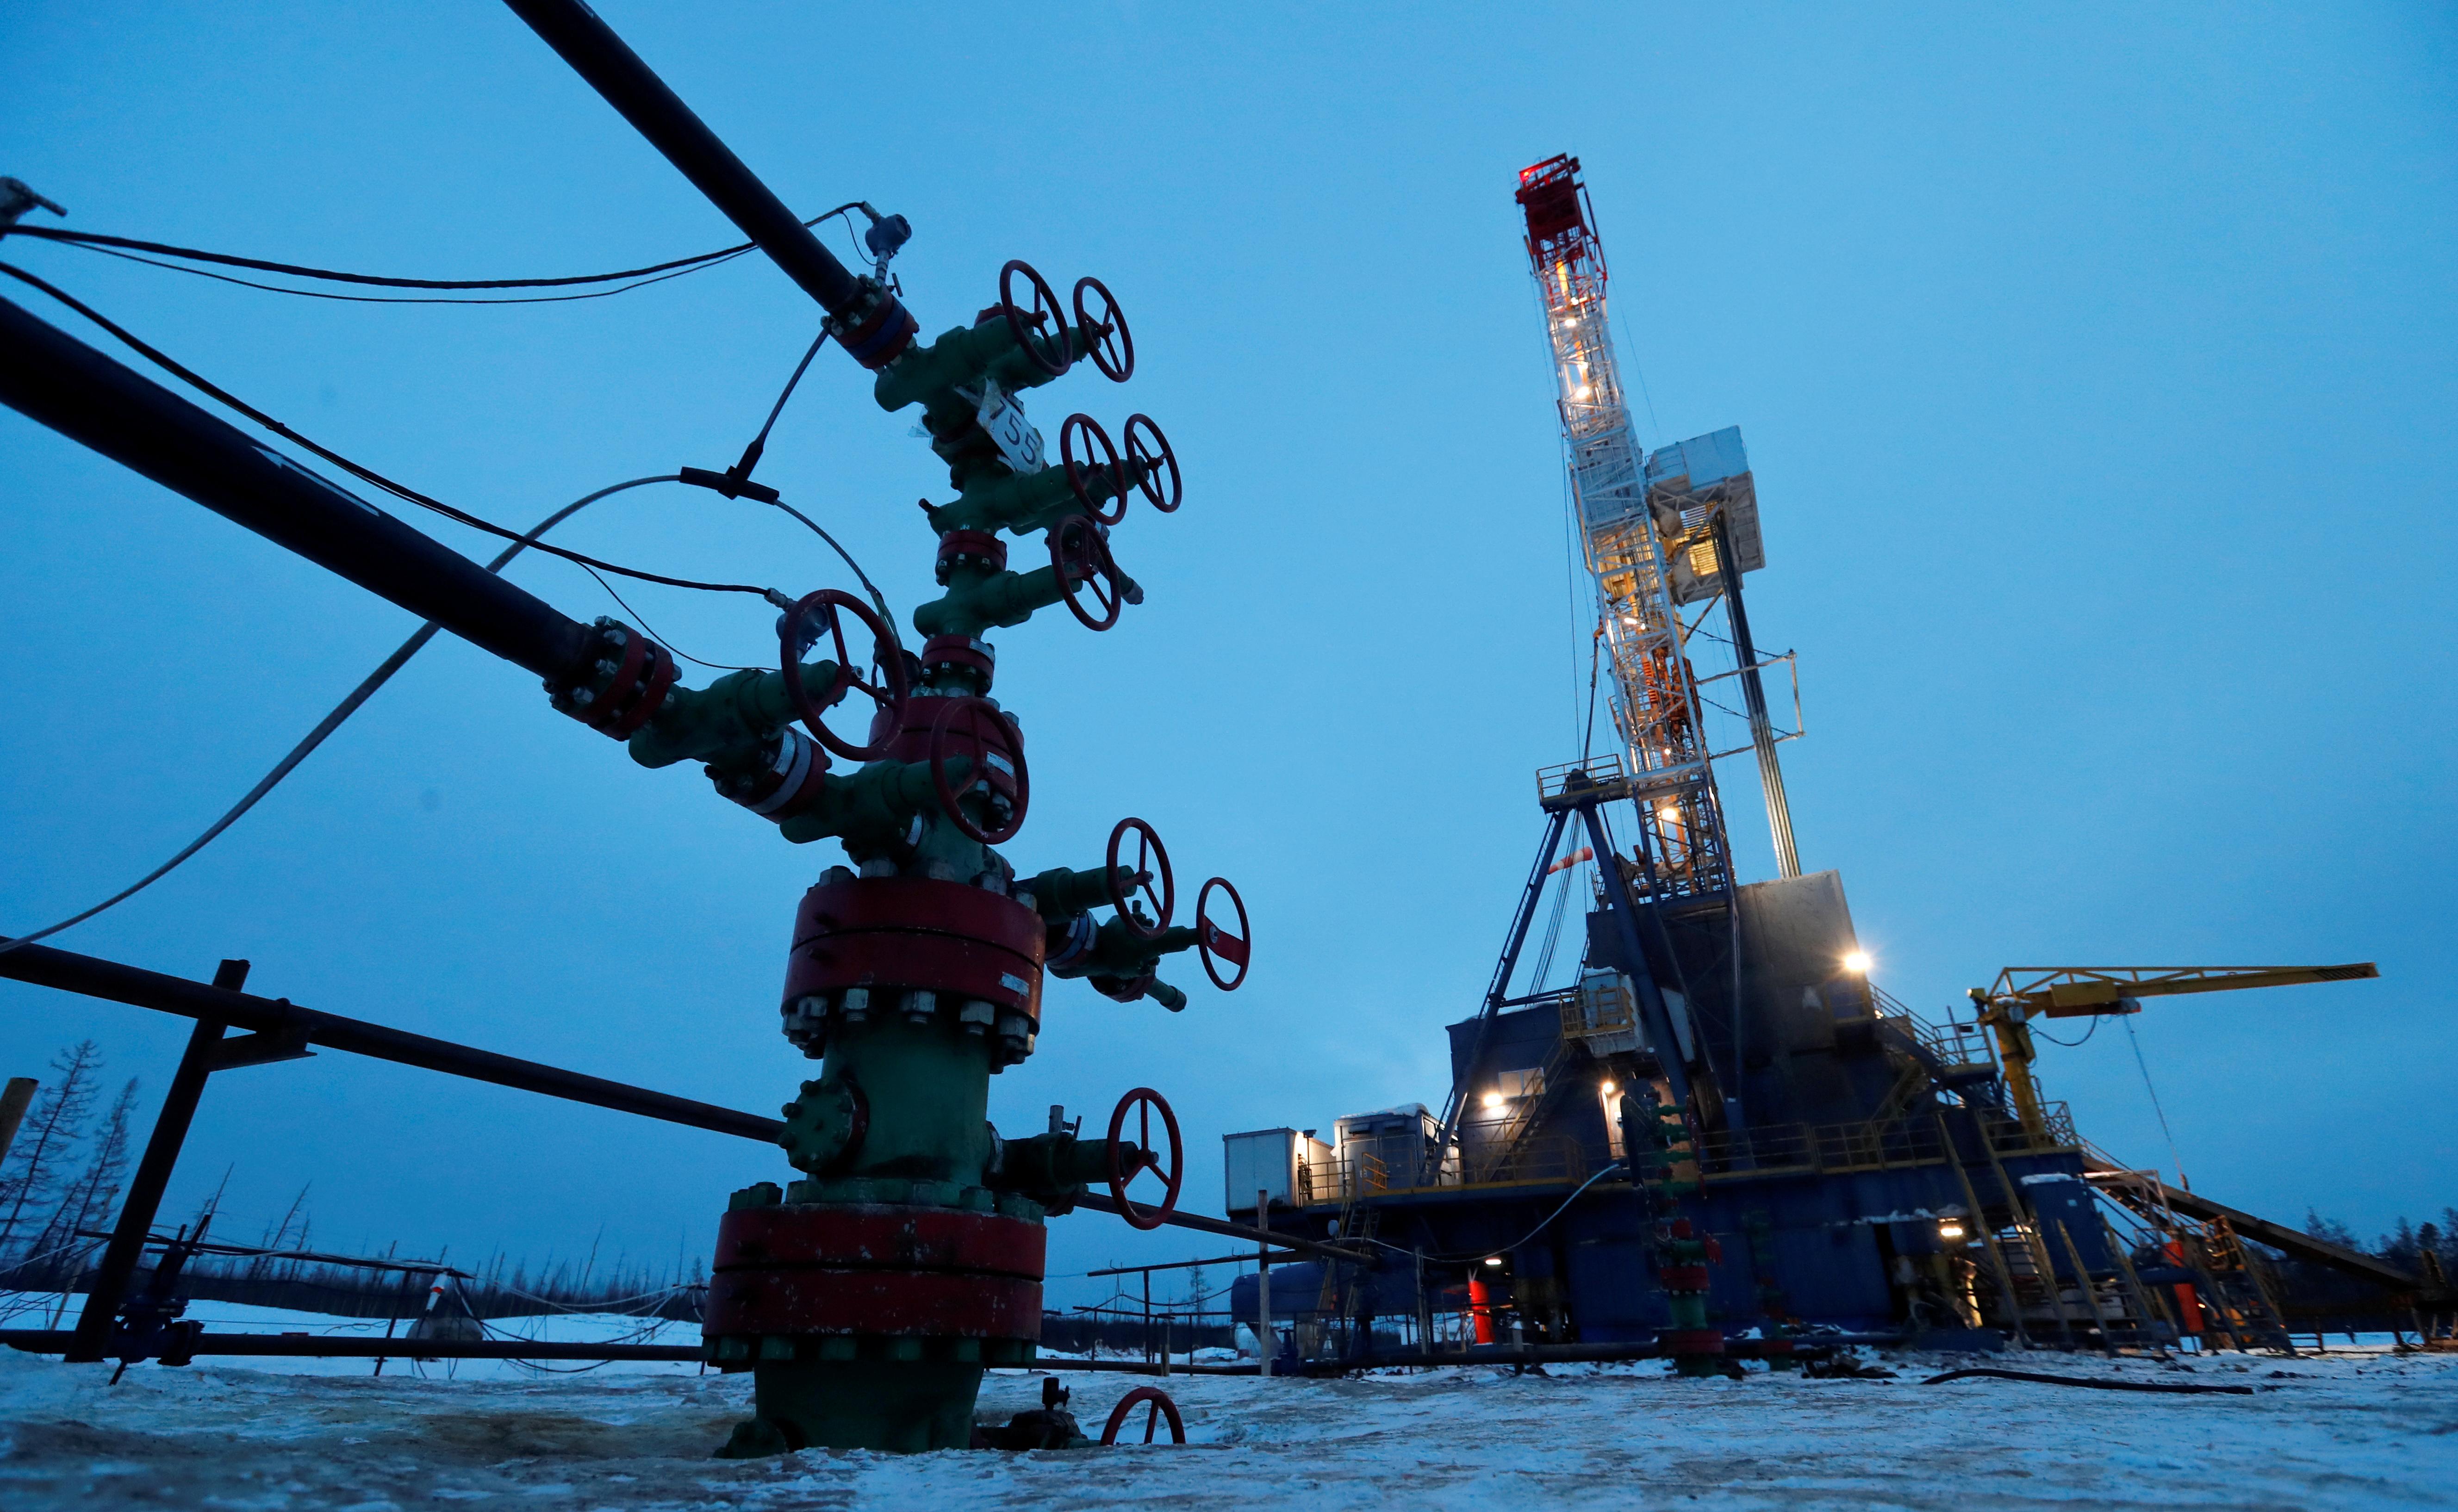 A well head and drilling rig in the Yarakta oilfield, owned by Irkutsk Oil Company (INK), in the Irkutsk region, Russia, March 11, 2019. REUTERS/Vasily Fedosenko